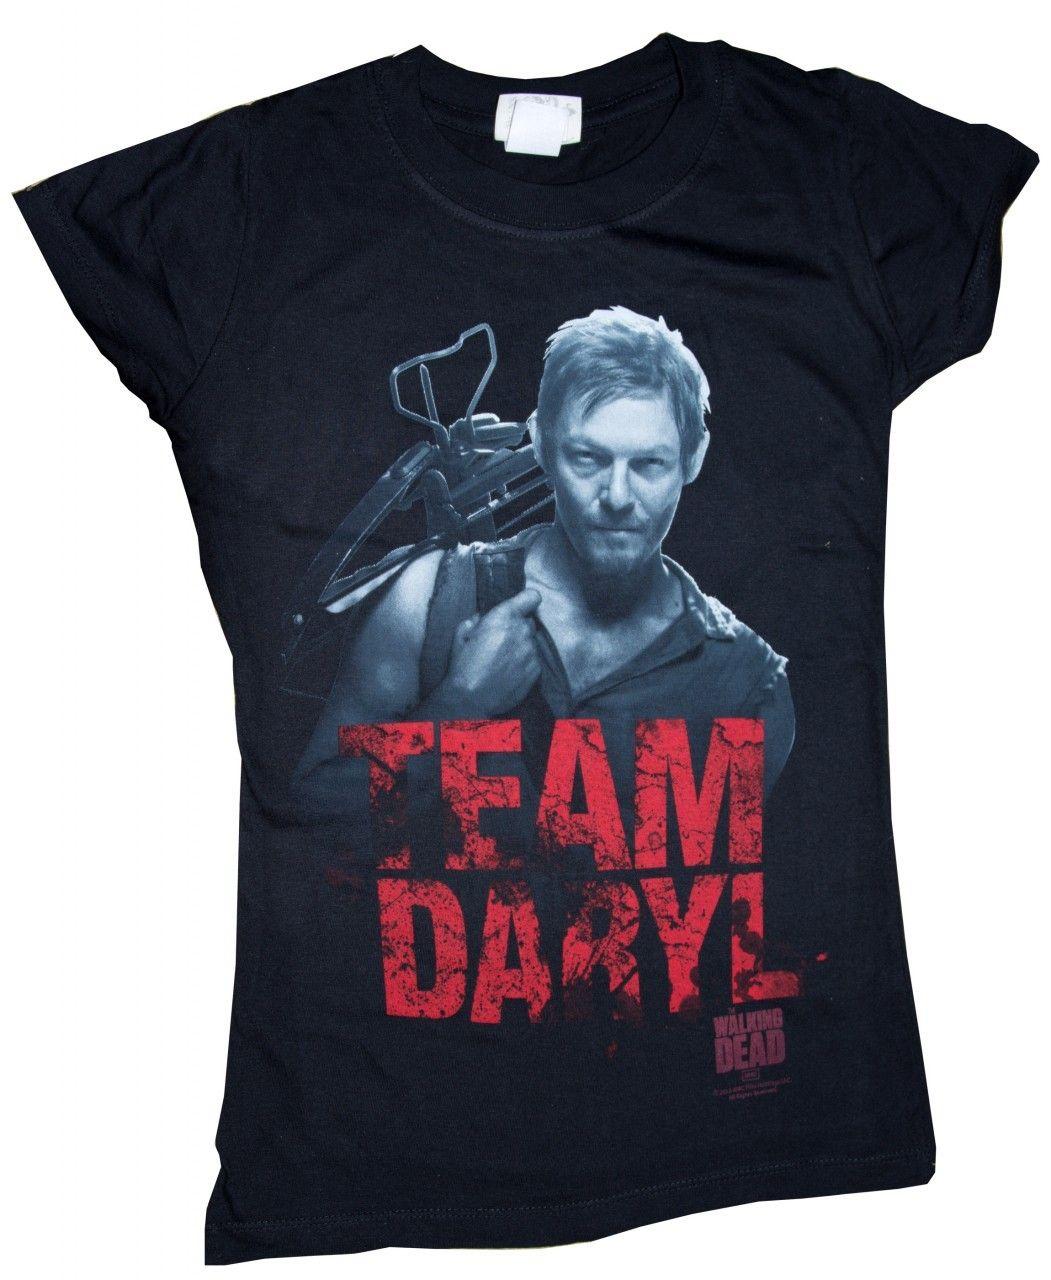 Walking Dead Merchandise | THE WALKING DEAD TEAM DARYL WOMAN'S/JUNIOR T- SHIRT